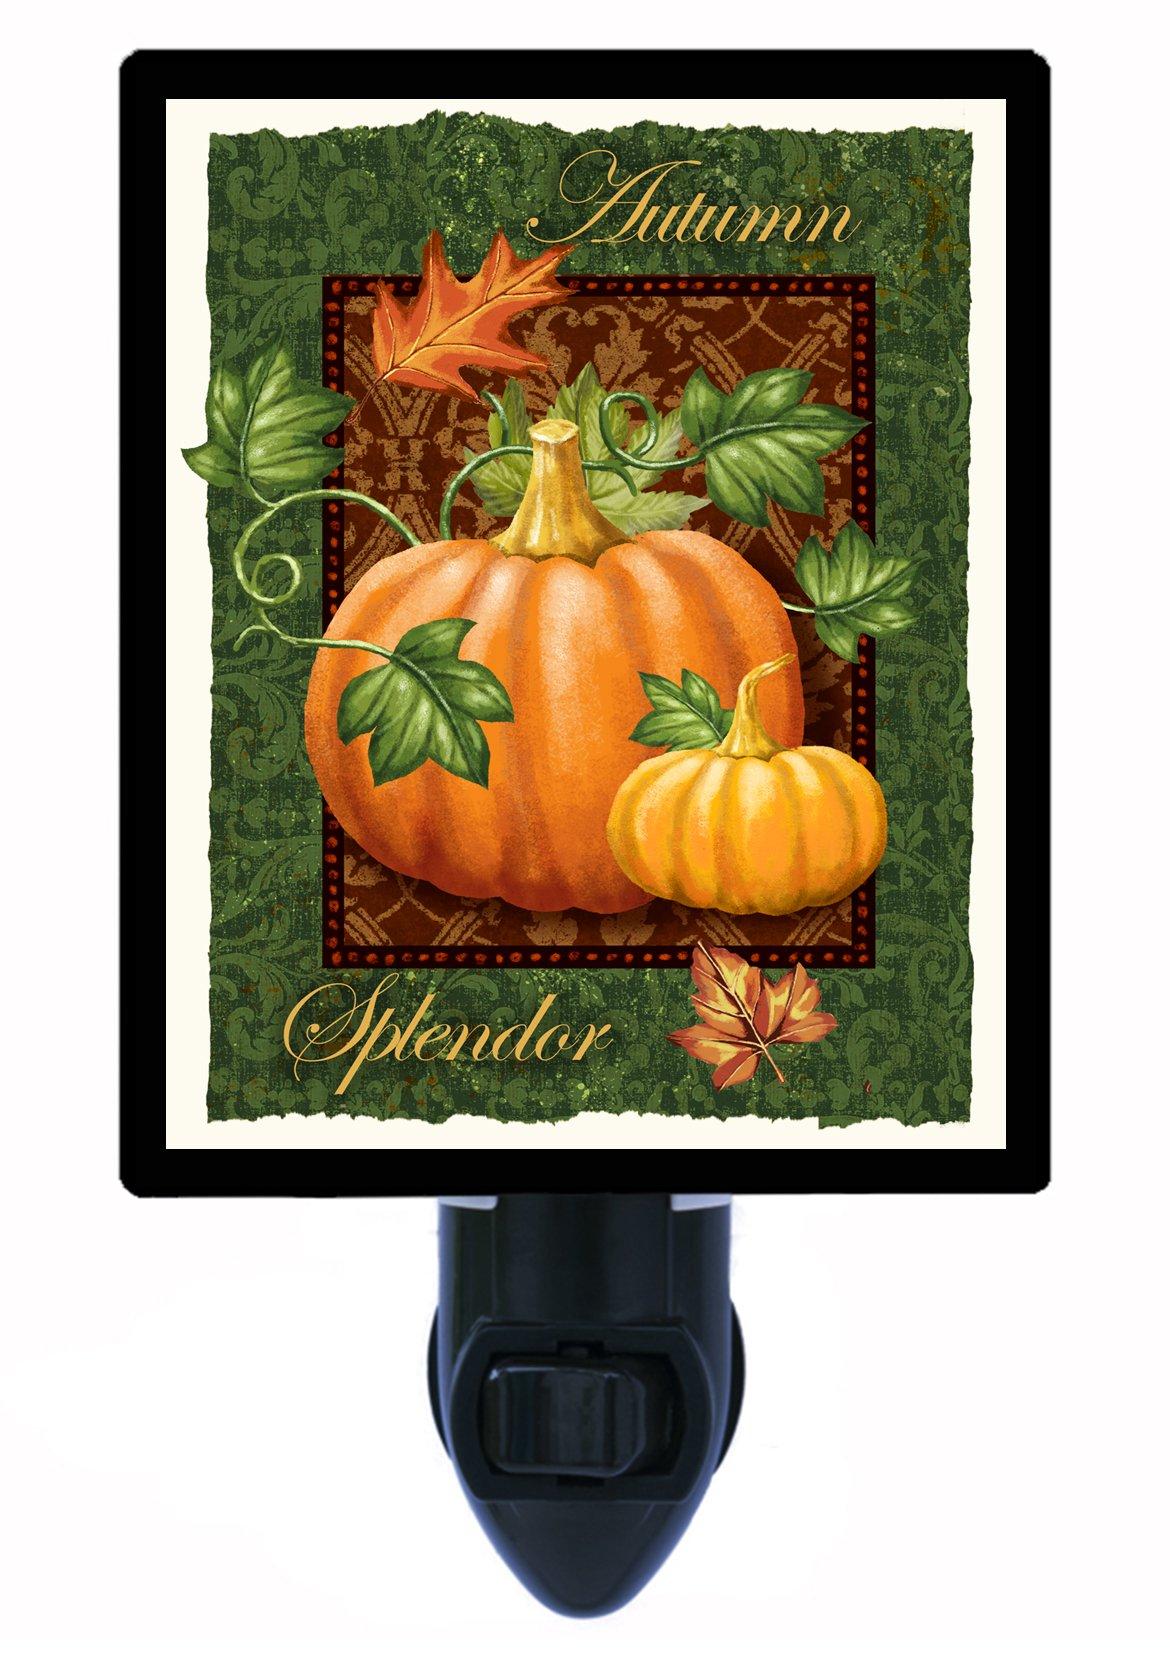 Fall and Autumn Night Light - Autumn Splendor - Pumpkin